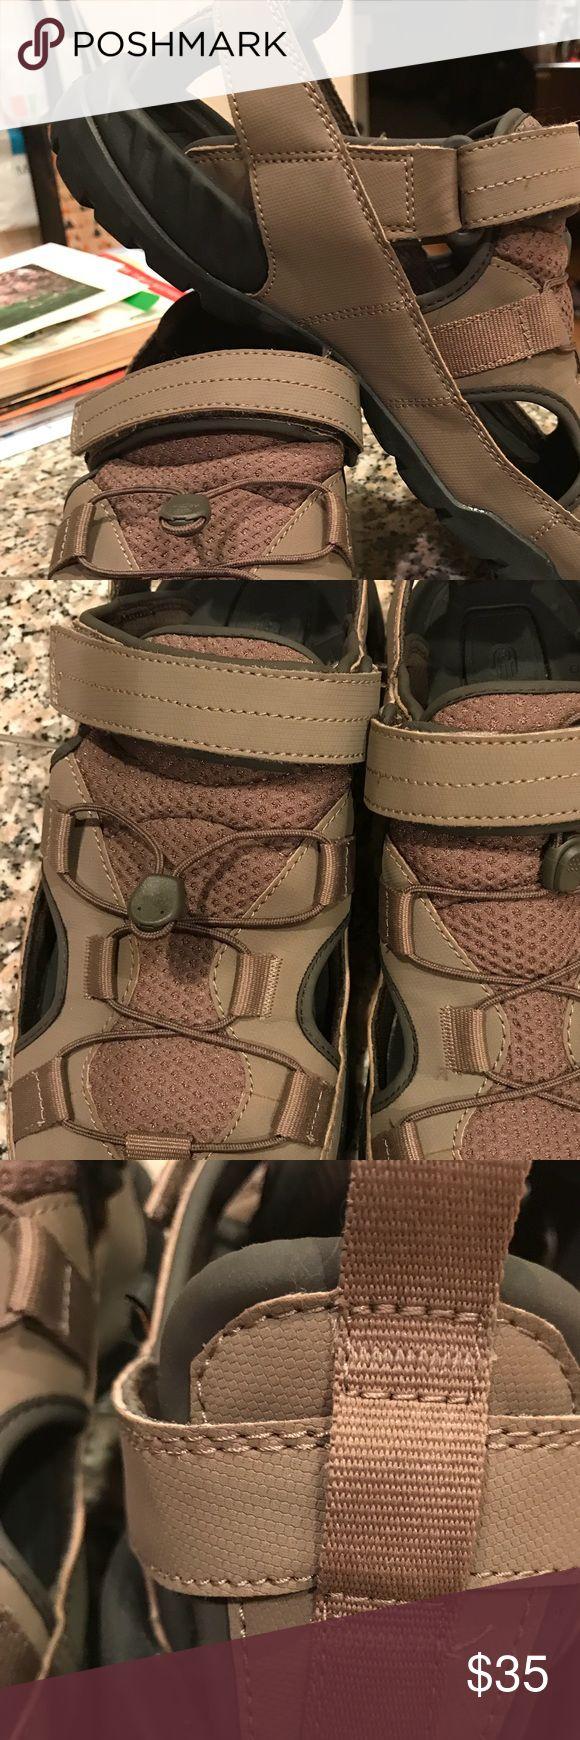 Teva men's sandals Teva men's sandals, model: Forebay 2, in walnut color. Size 12M Teva Shoes Sandals & Flip-Flops